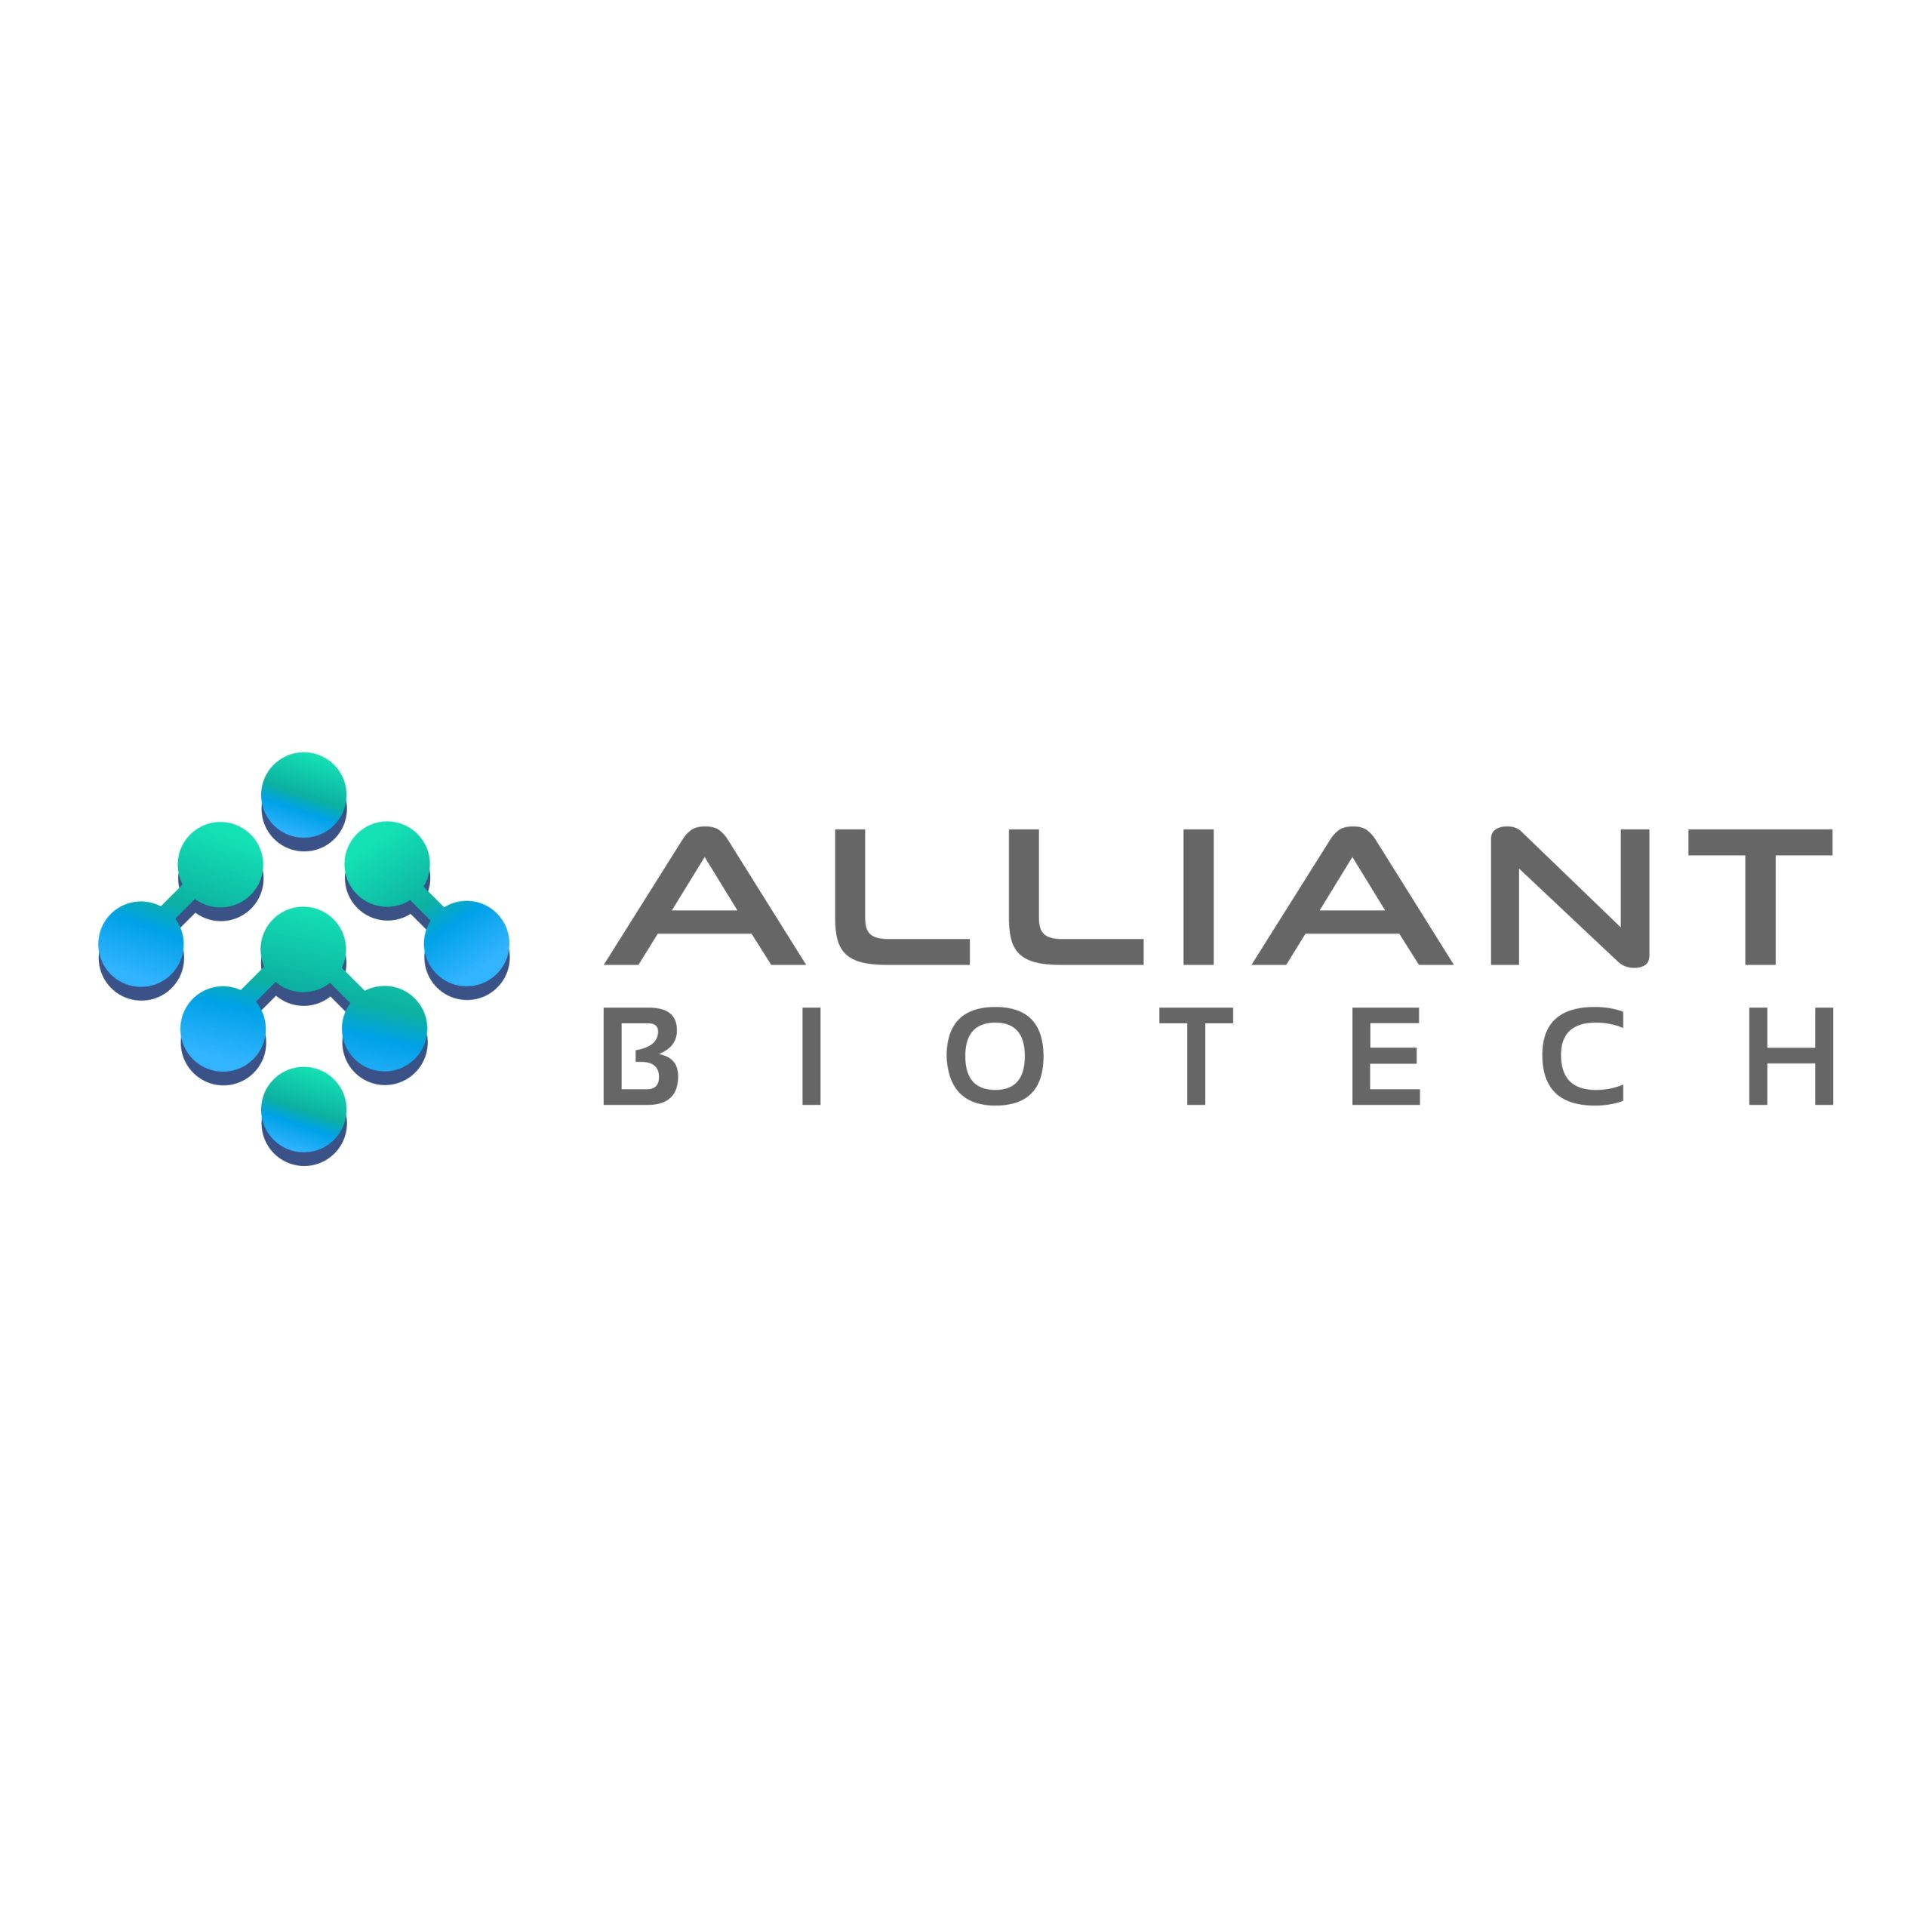 Alliant Biotech logo